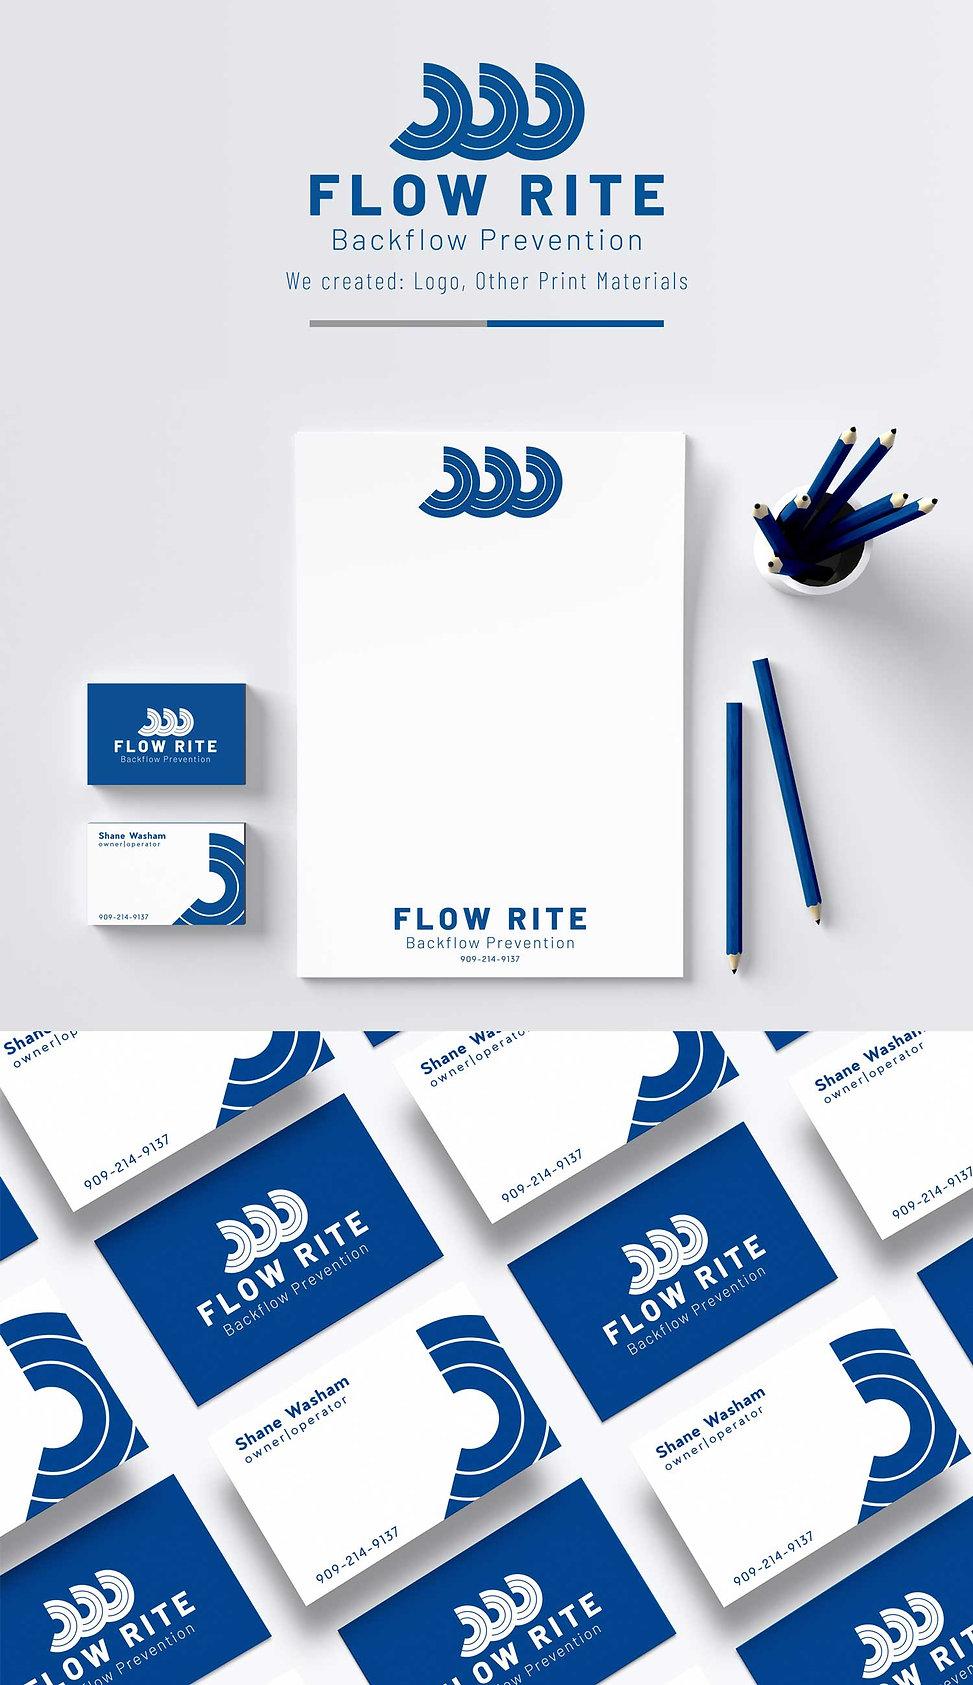 FlowRite.jpg